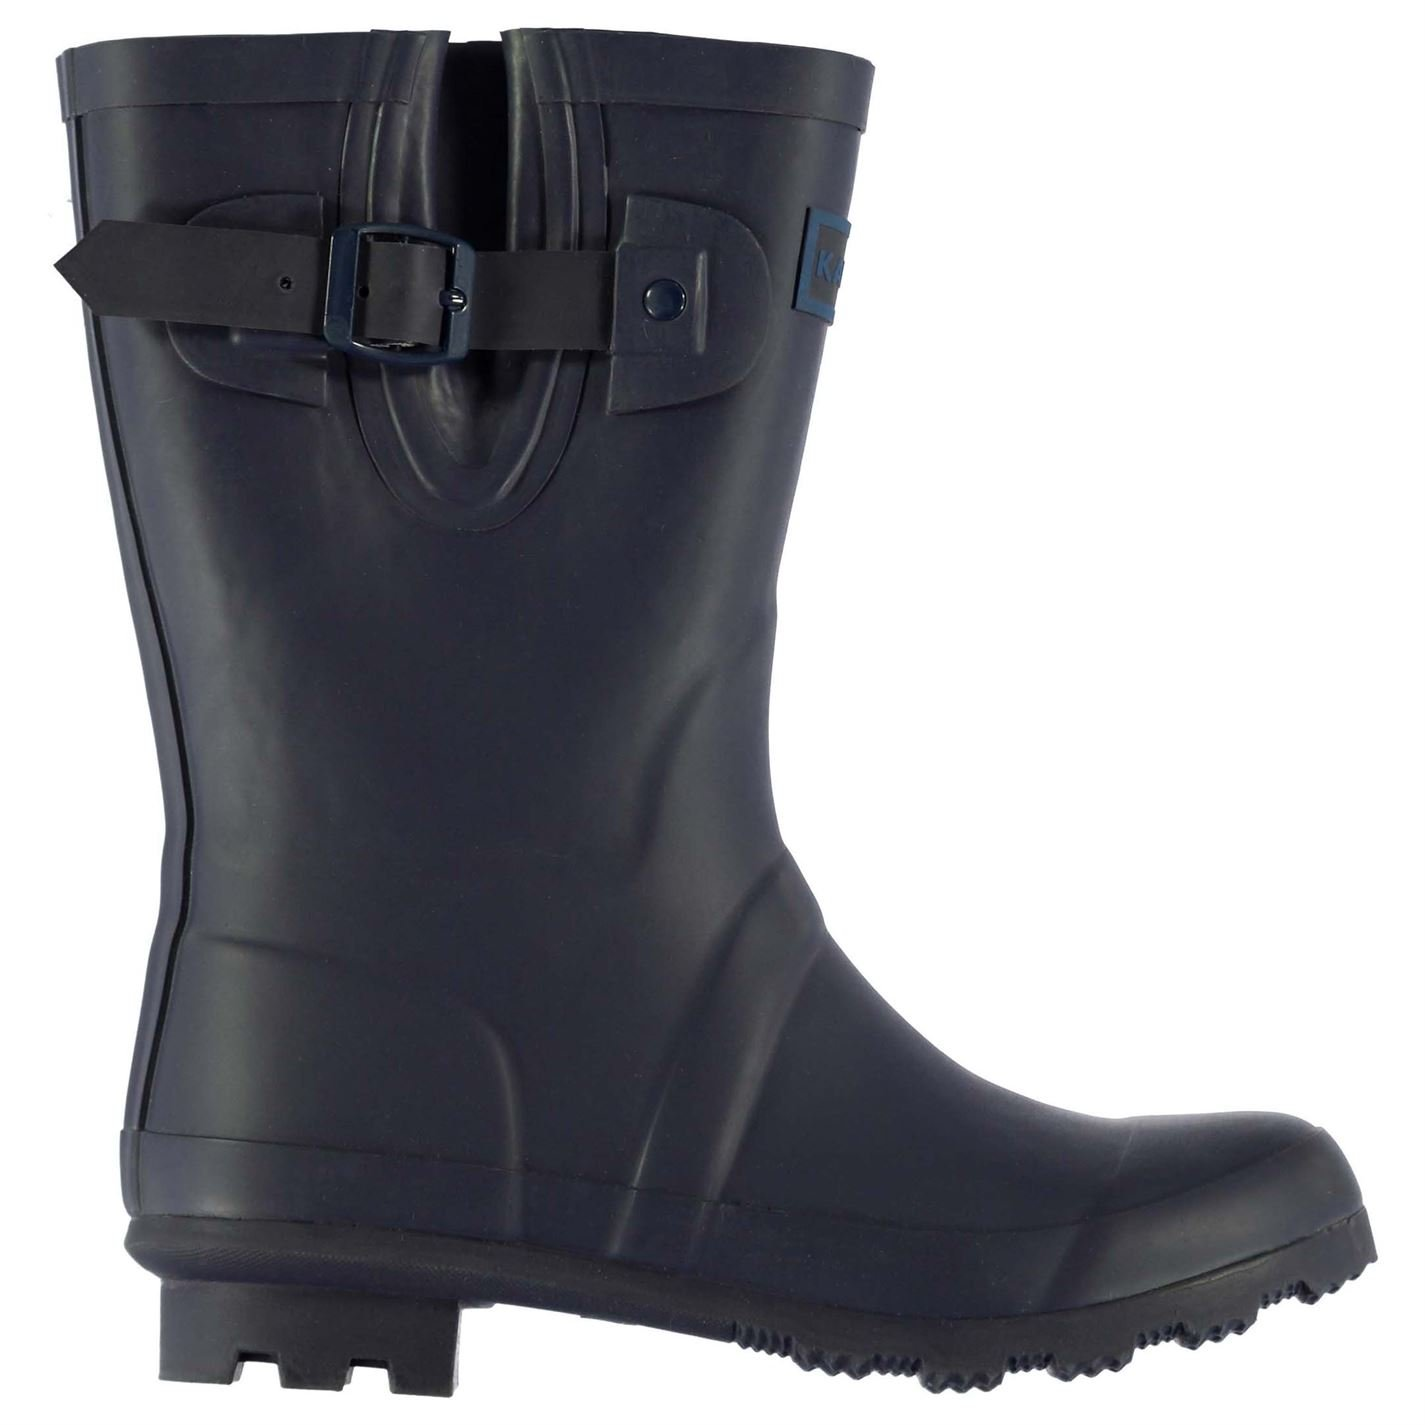 Kangol Kids Tall Wellies Childs Wellingtons Buckle Pattern Boots Shoes Navy/Blue UK C11 (29)